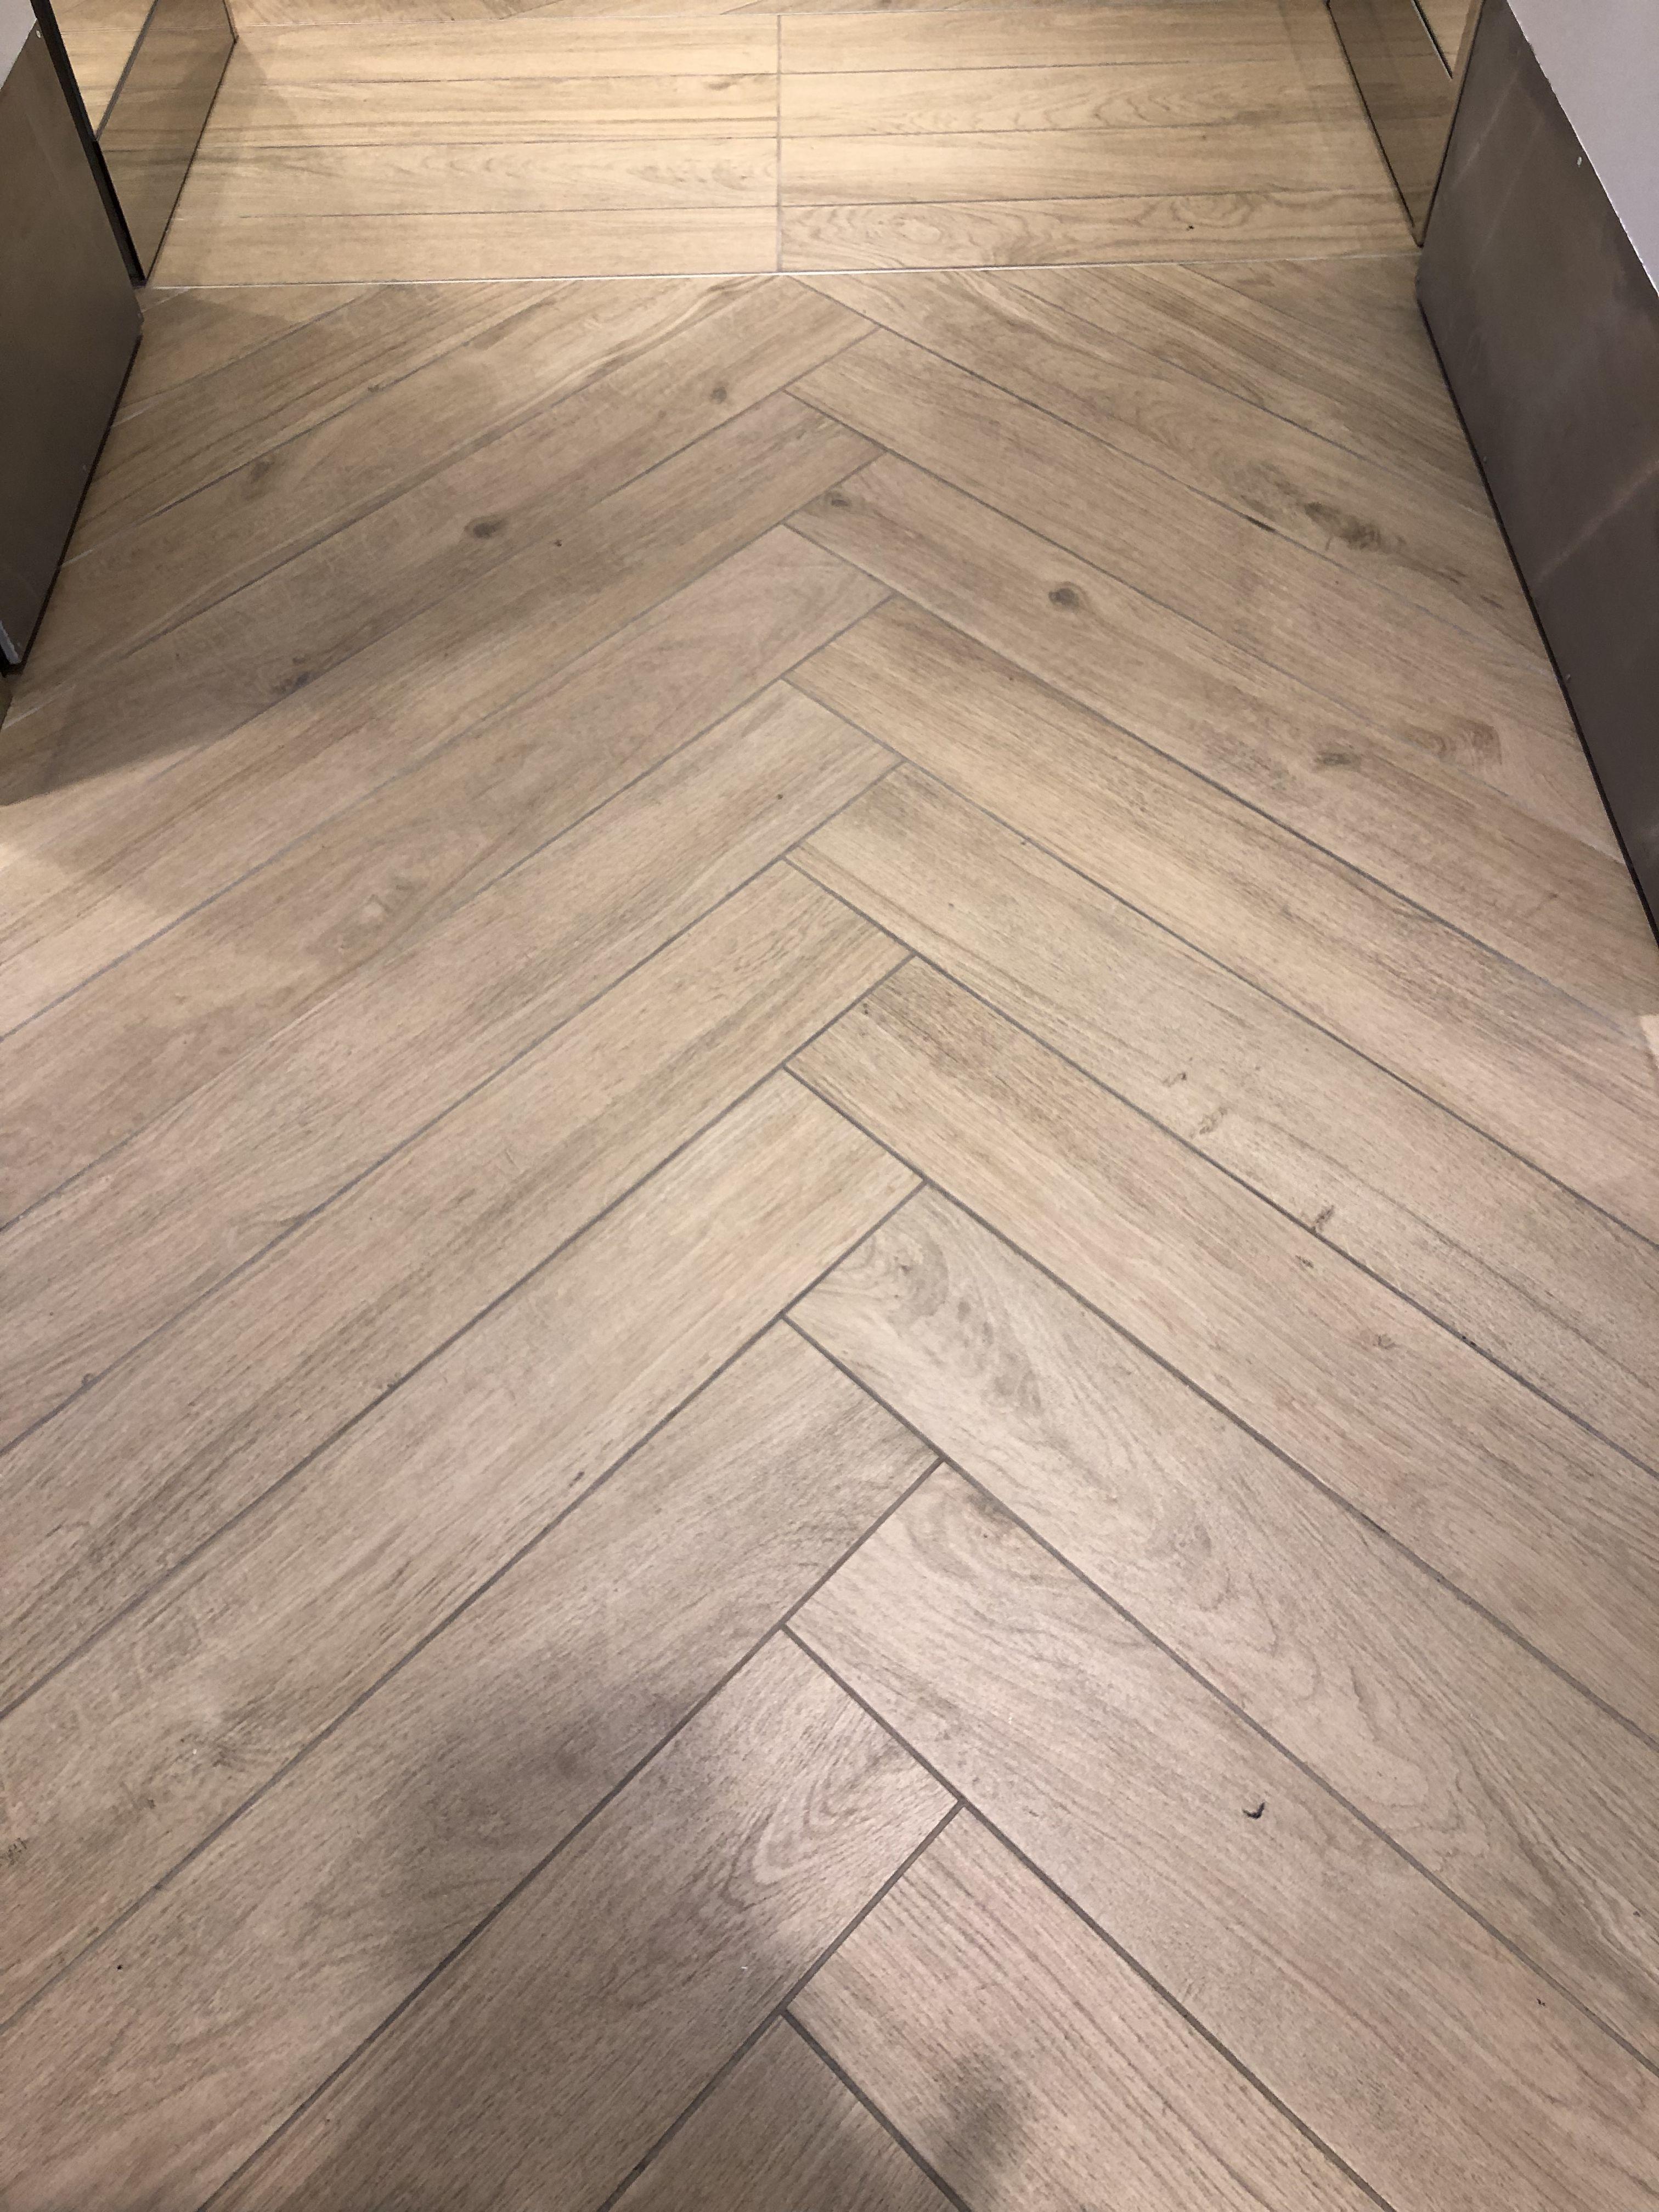 Parquet Parquetflooring Chene Wood Chevron Floordesign Garesconception Devis Gratuit Parquet Herringbone Ekkor 2019